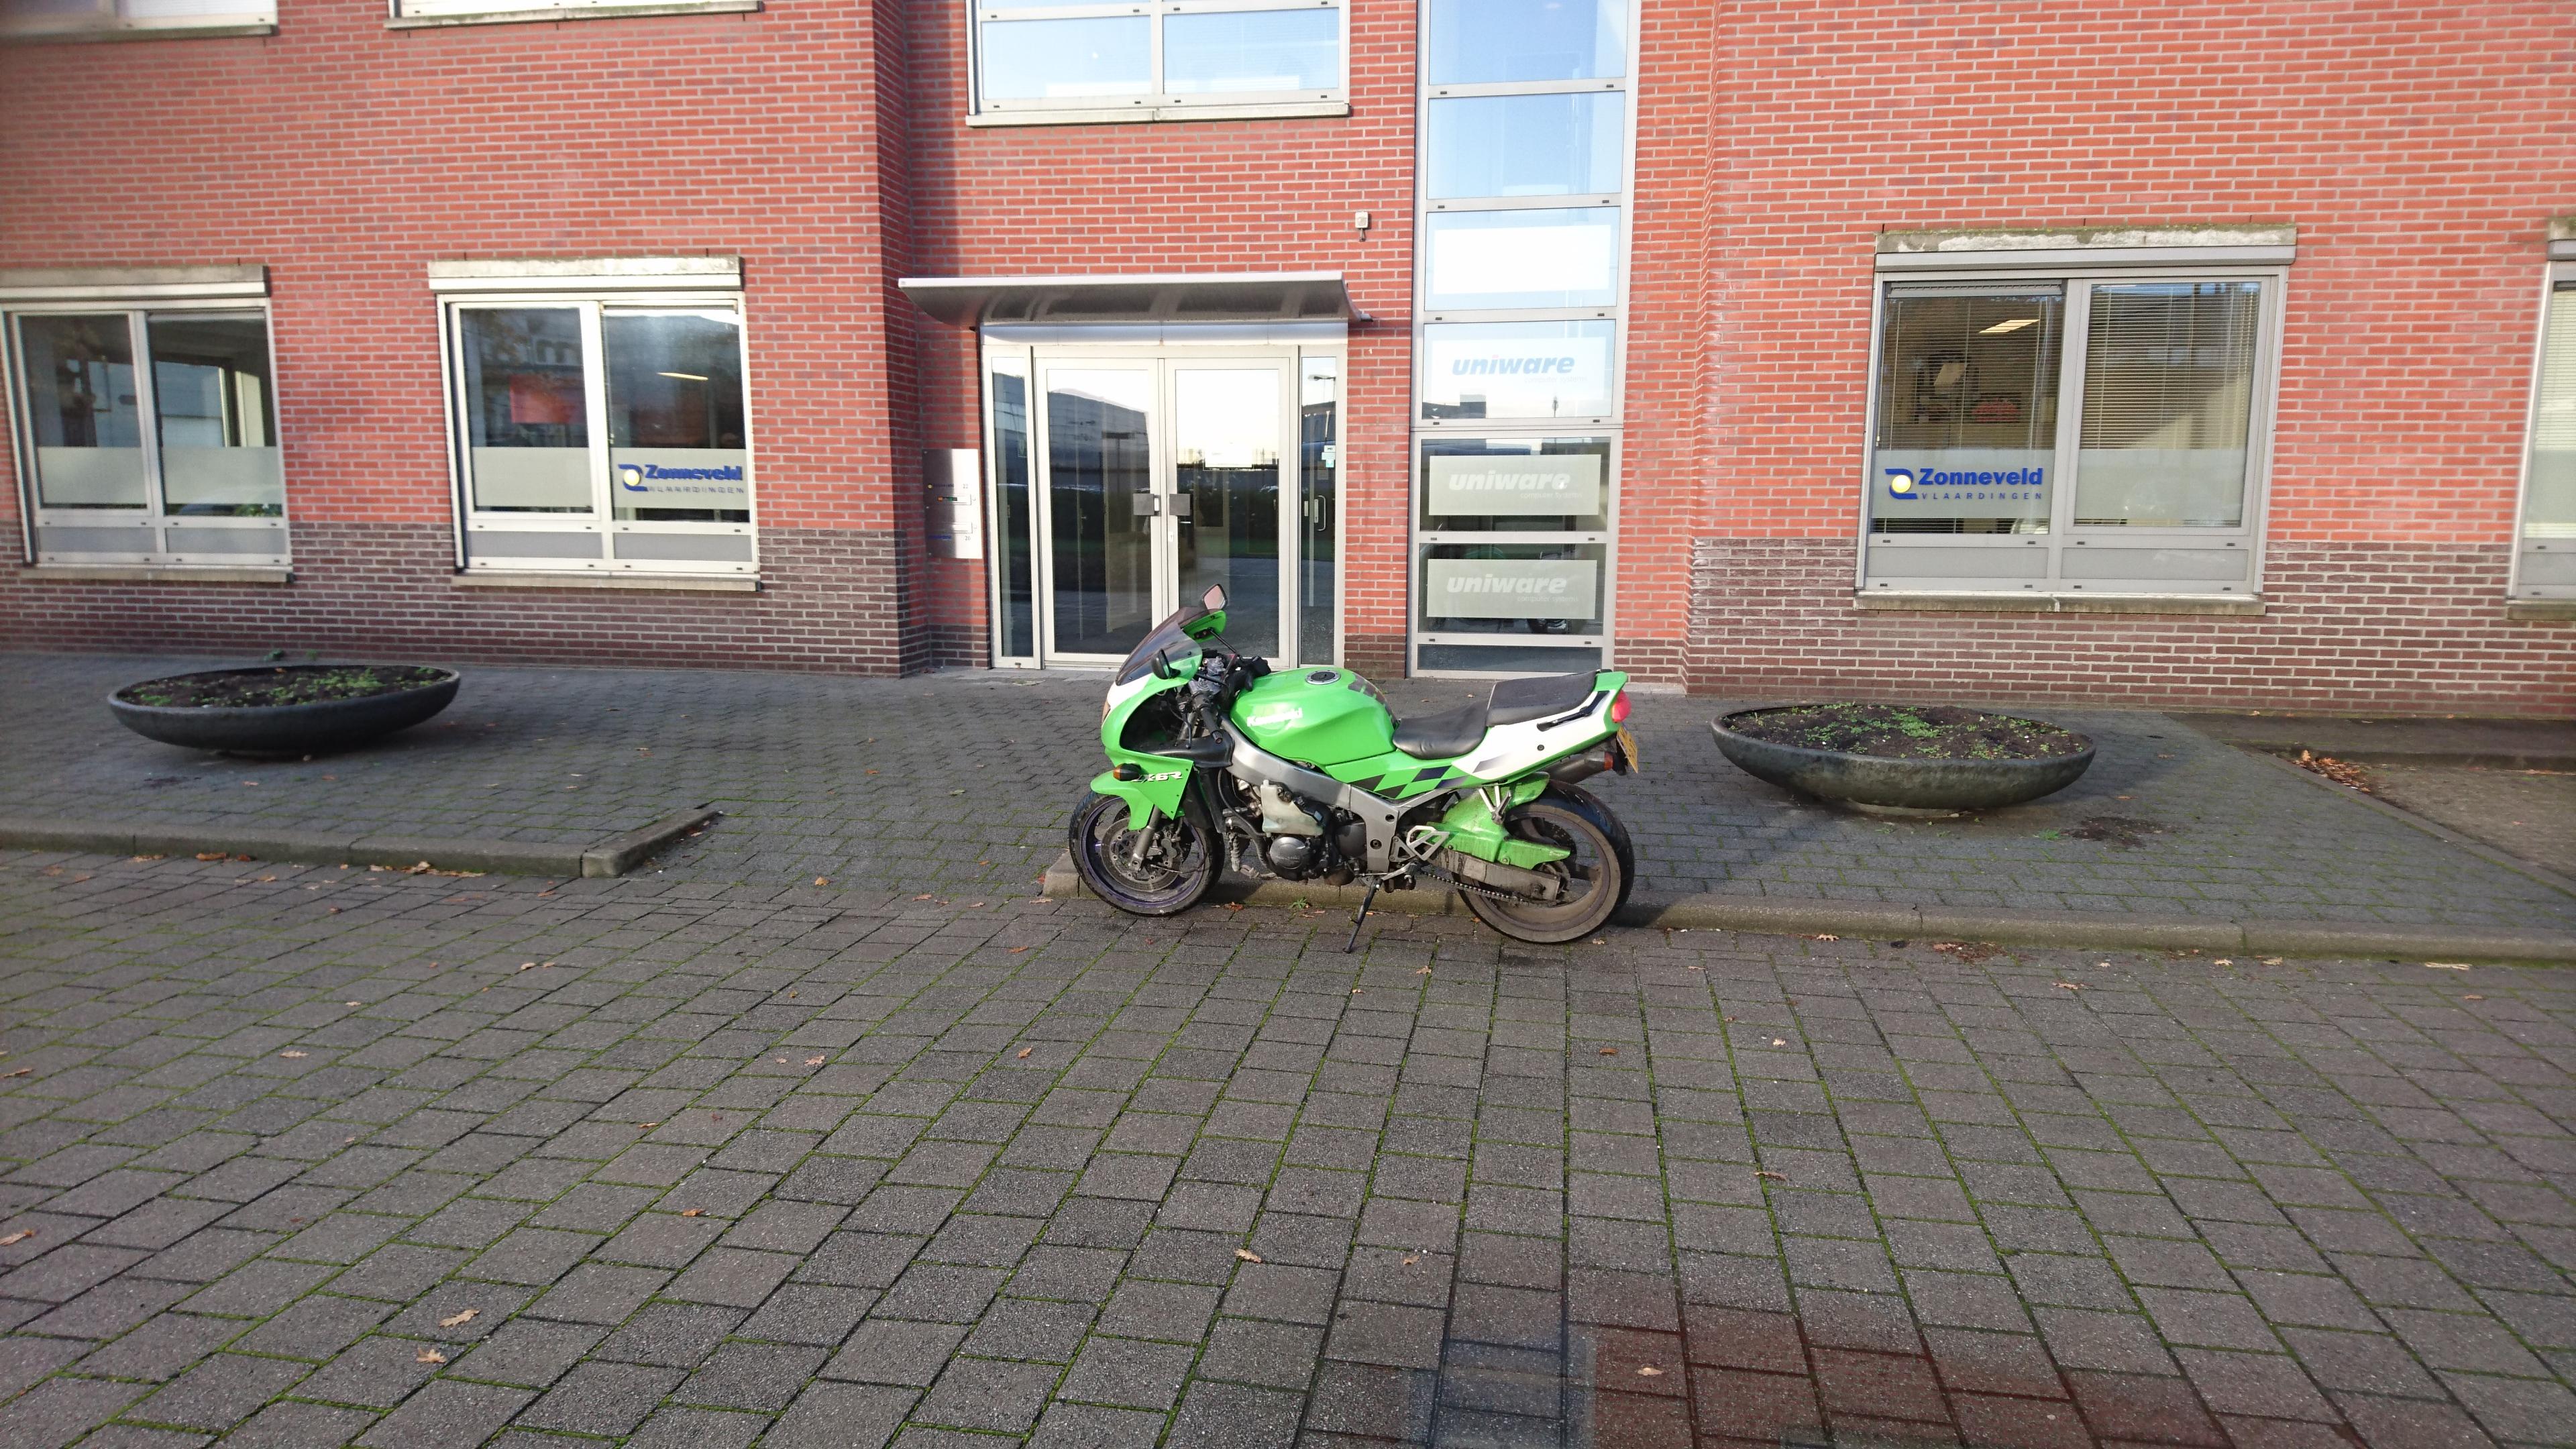 http://piczwart.nl/moto/punten/633.jpg